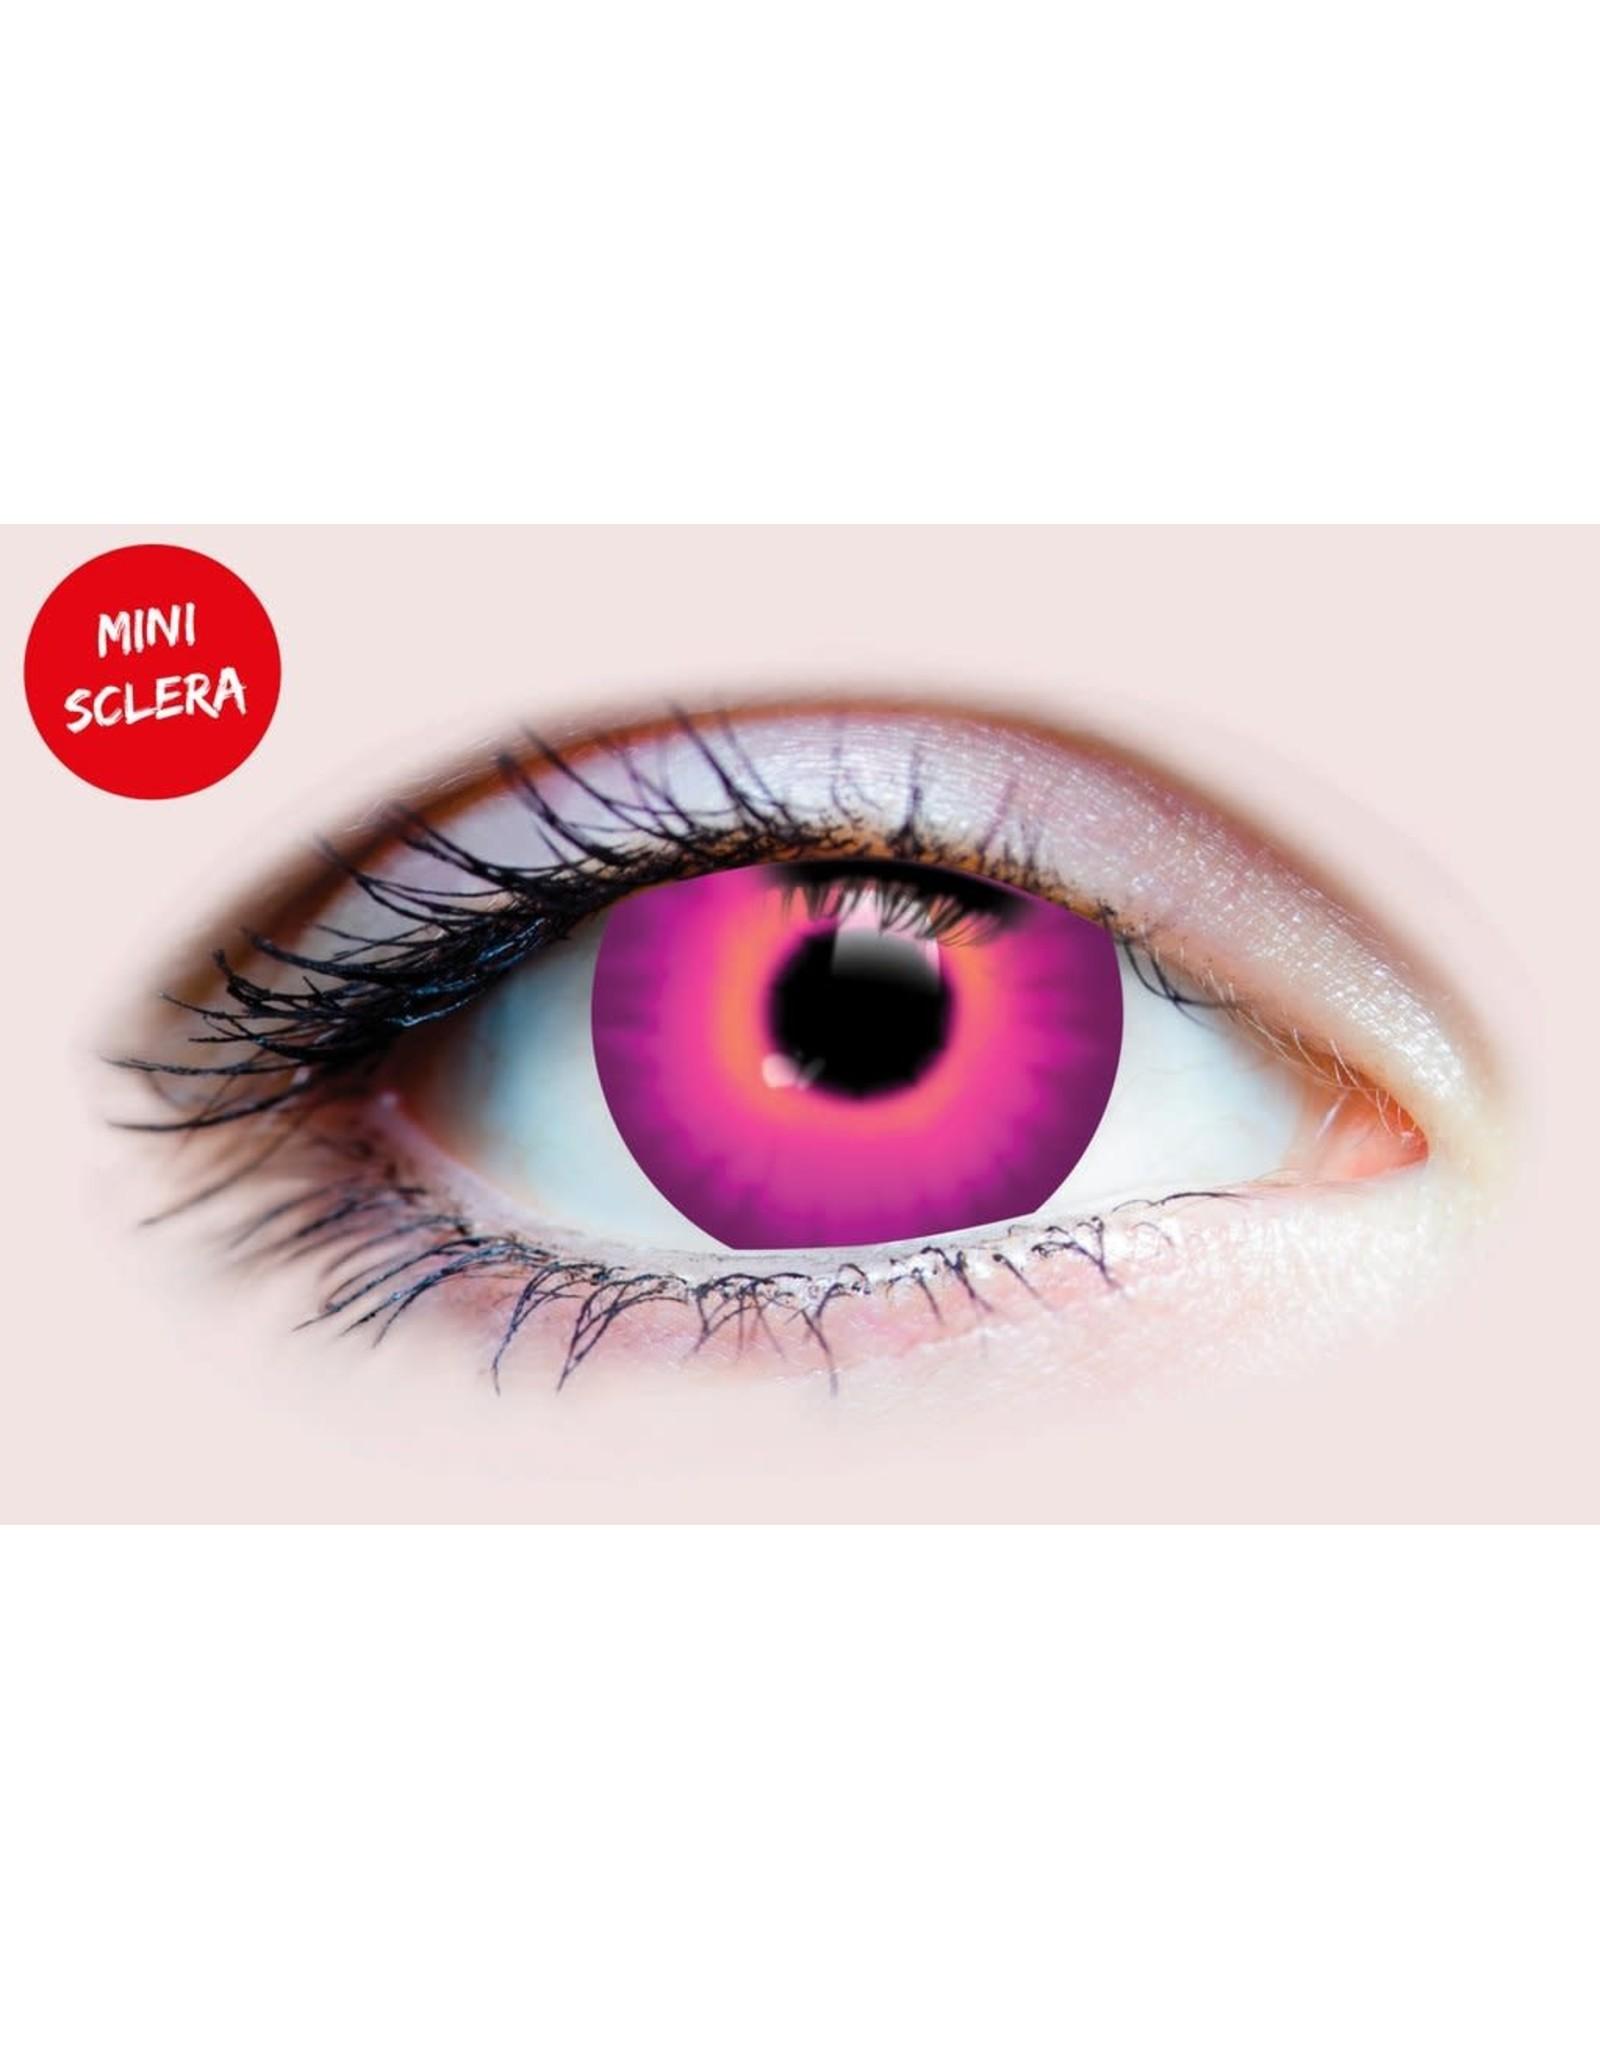 Primal Mini Sclera Costume Contact Lenses